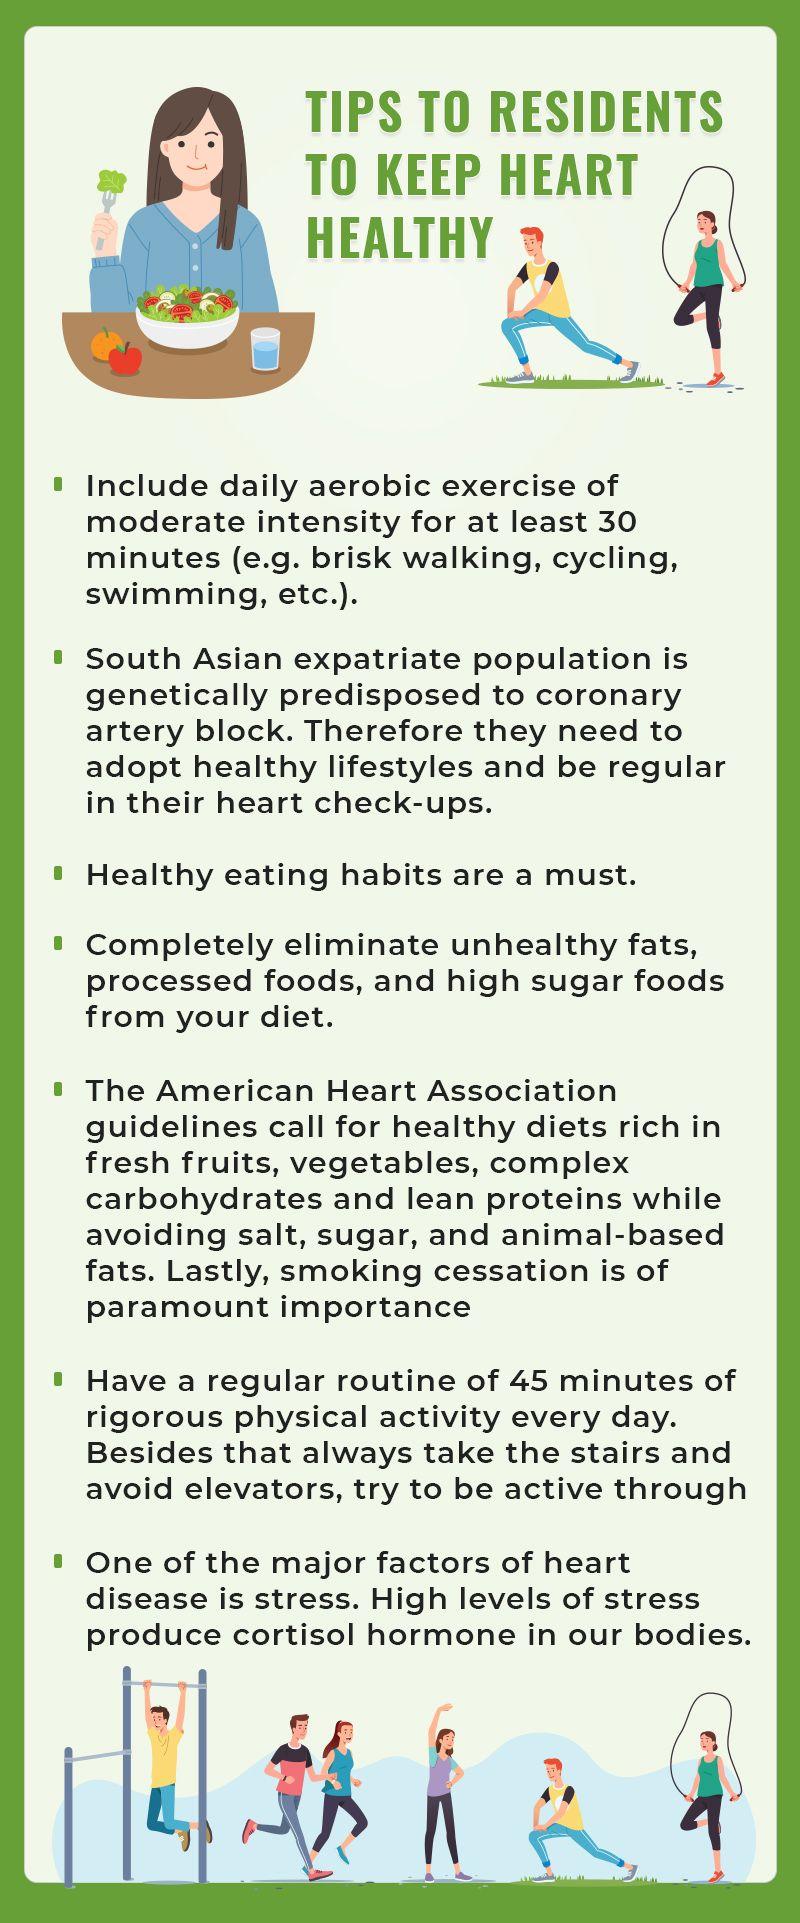 Tips to keep heart health